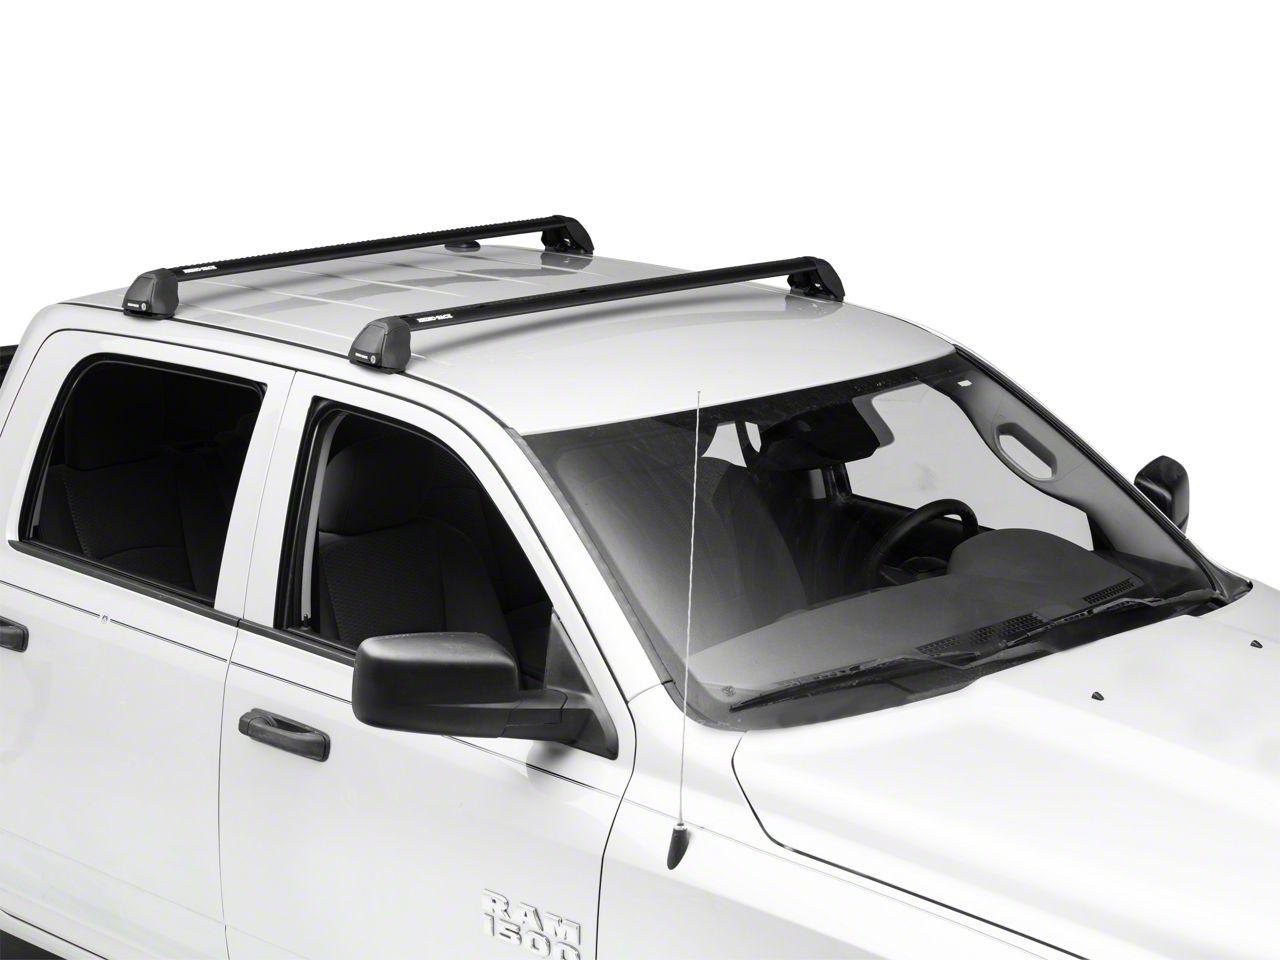 Rhino-Rack Vortex 2500 RS 2-Bar Roof Rack - Black (09-18 RAM 1500 Quad Cab, Crew Cab)